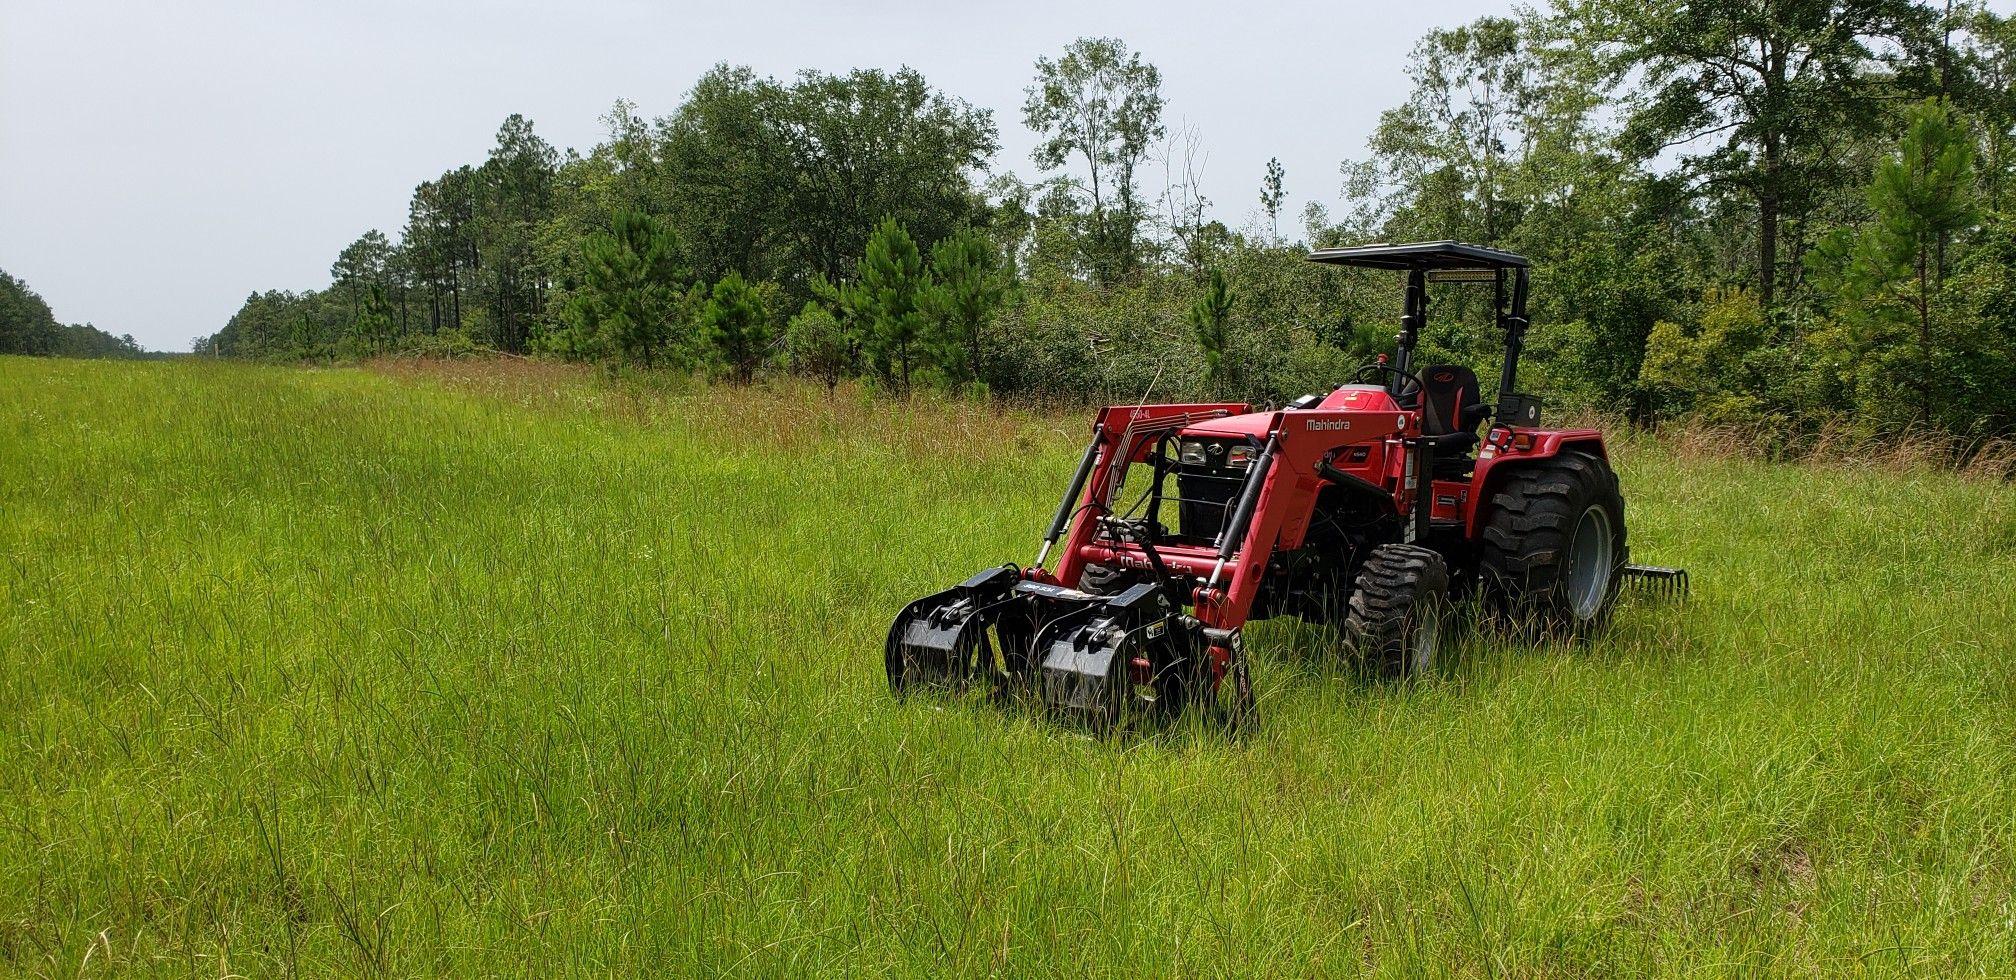 Mahindra 4540 Tractors Heavy Equipment 4wd